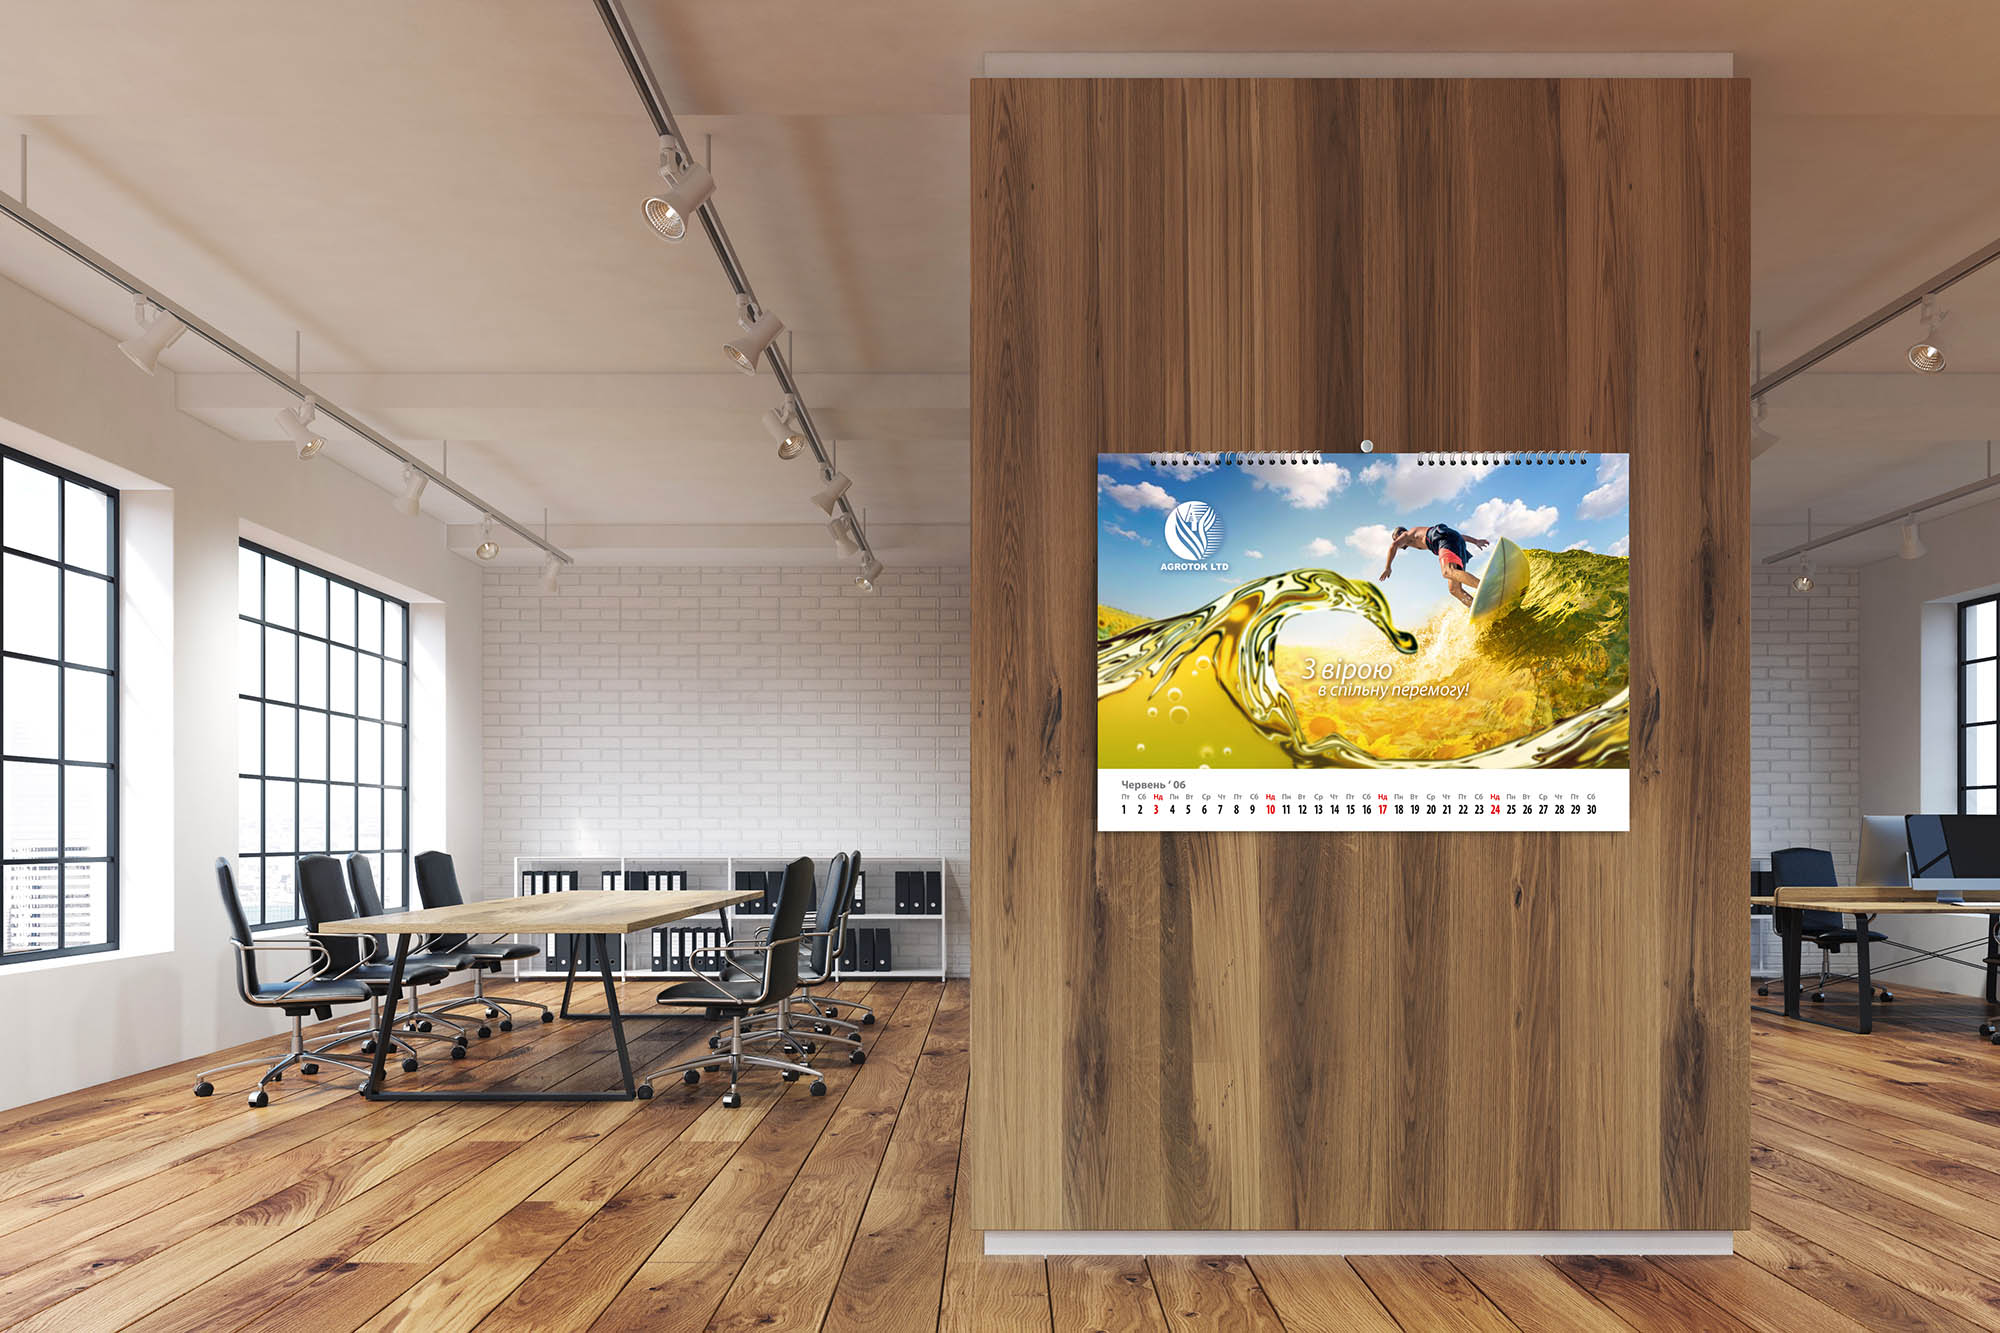 Разработка и реализация идеи настенного календаря 2018 г. портфолио